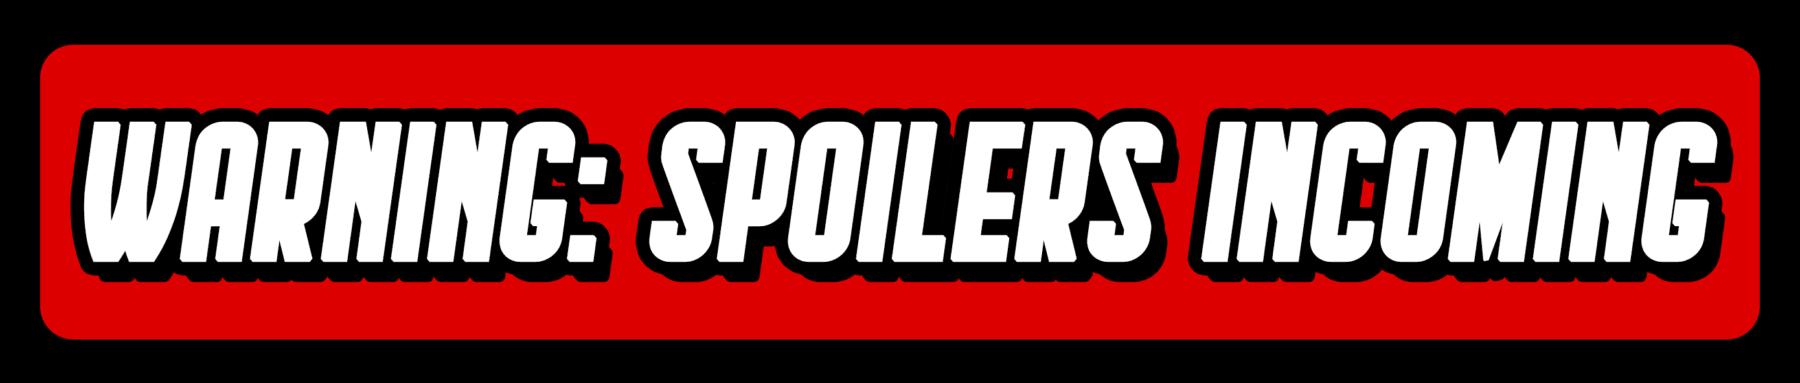 Spoilers-Warning-Small-Screen